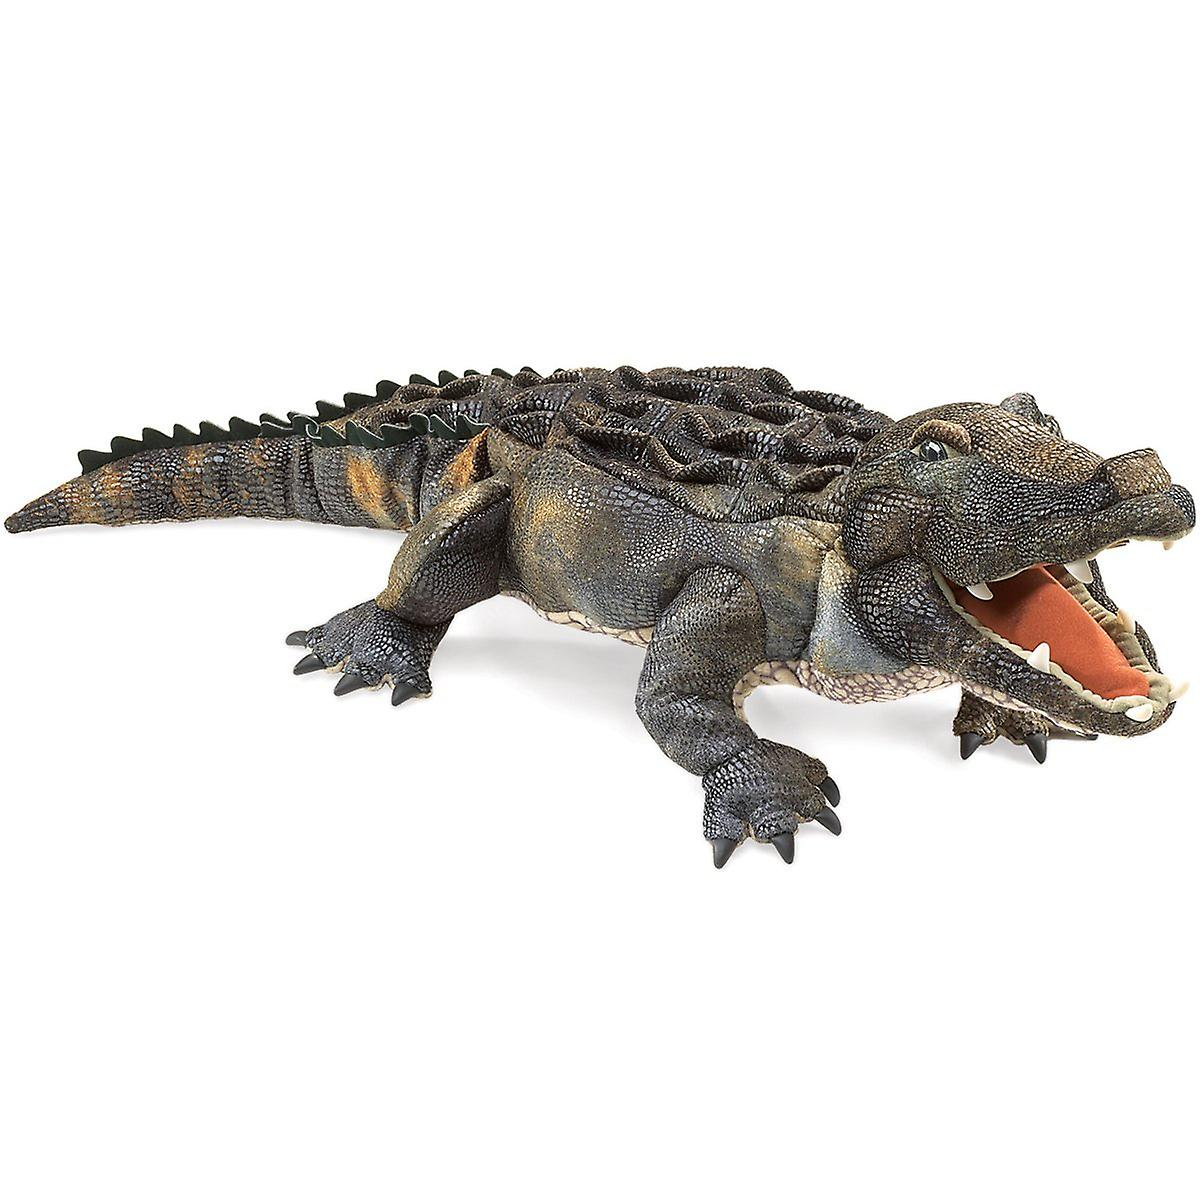 Hand Puppet - Folkhommeis - Alligator American nouveau Soft Doll Plush Toys 2921